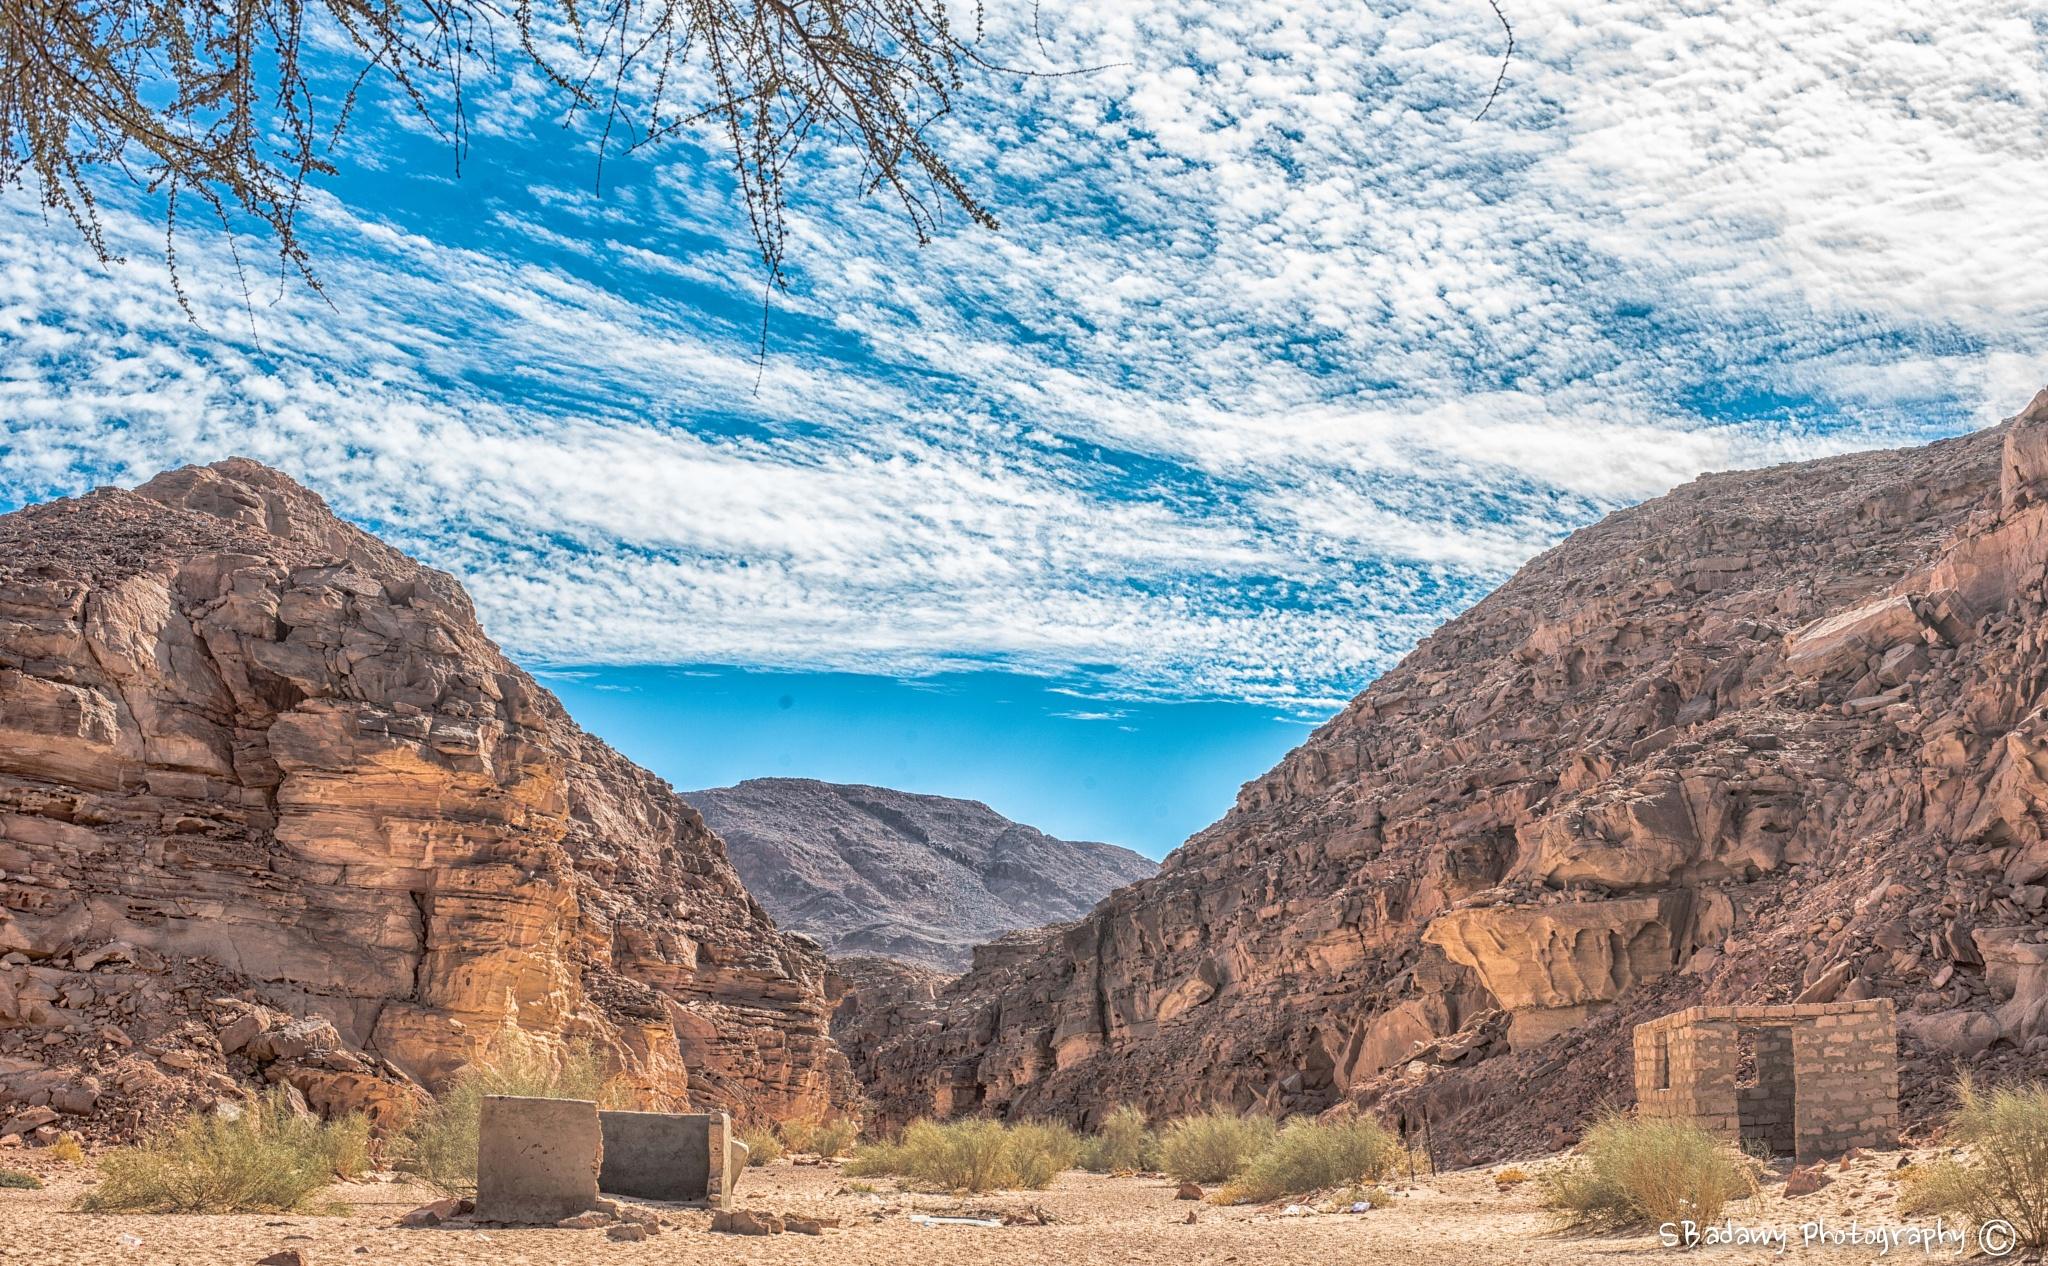 Canyon - Dahab  by Sherif Badawy